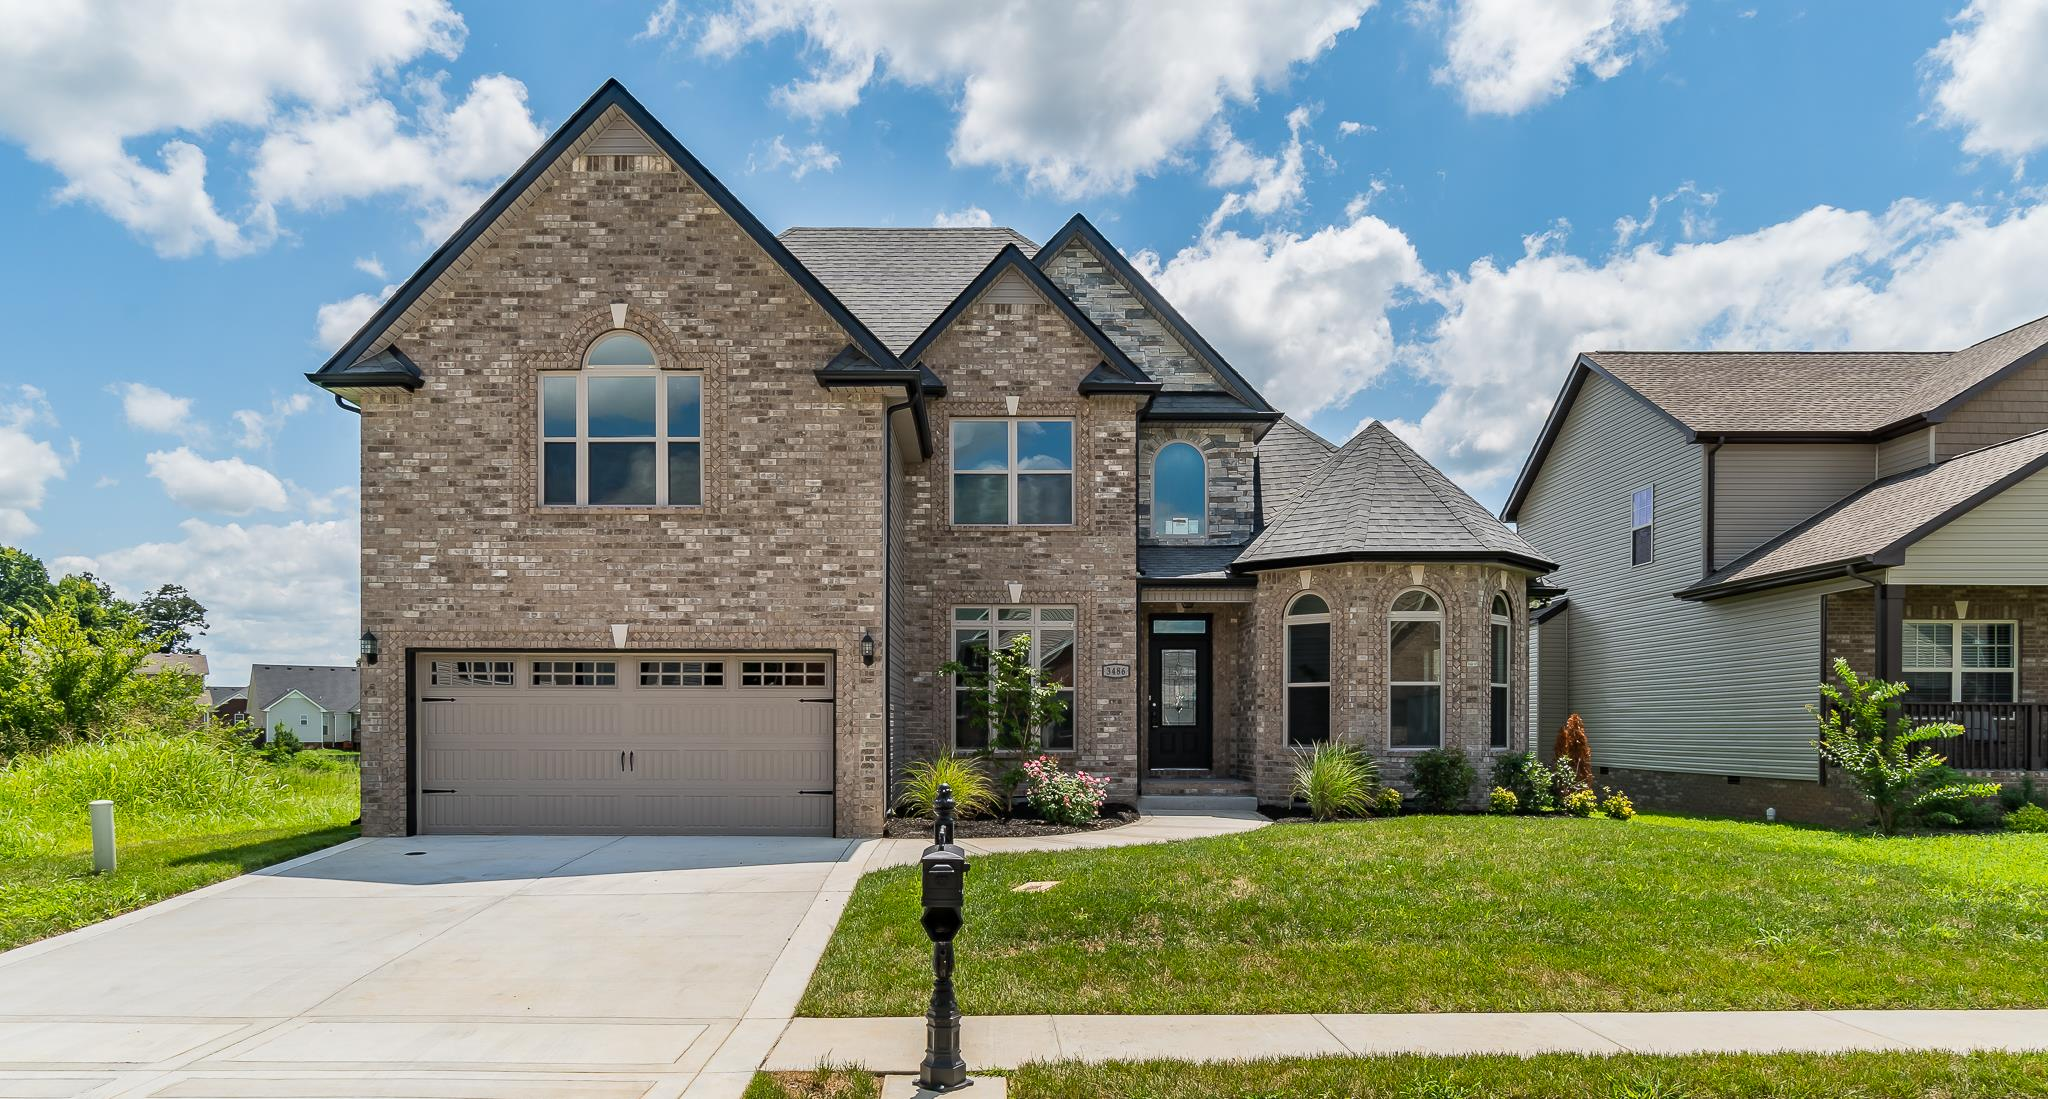 158 Fields of Northmeade, Clarksville, TN 37042 - Clarksville, TN real estate listing